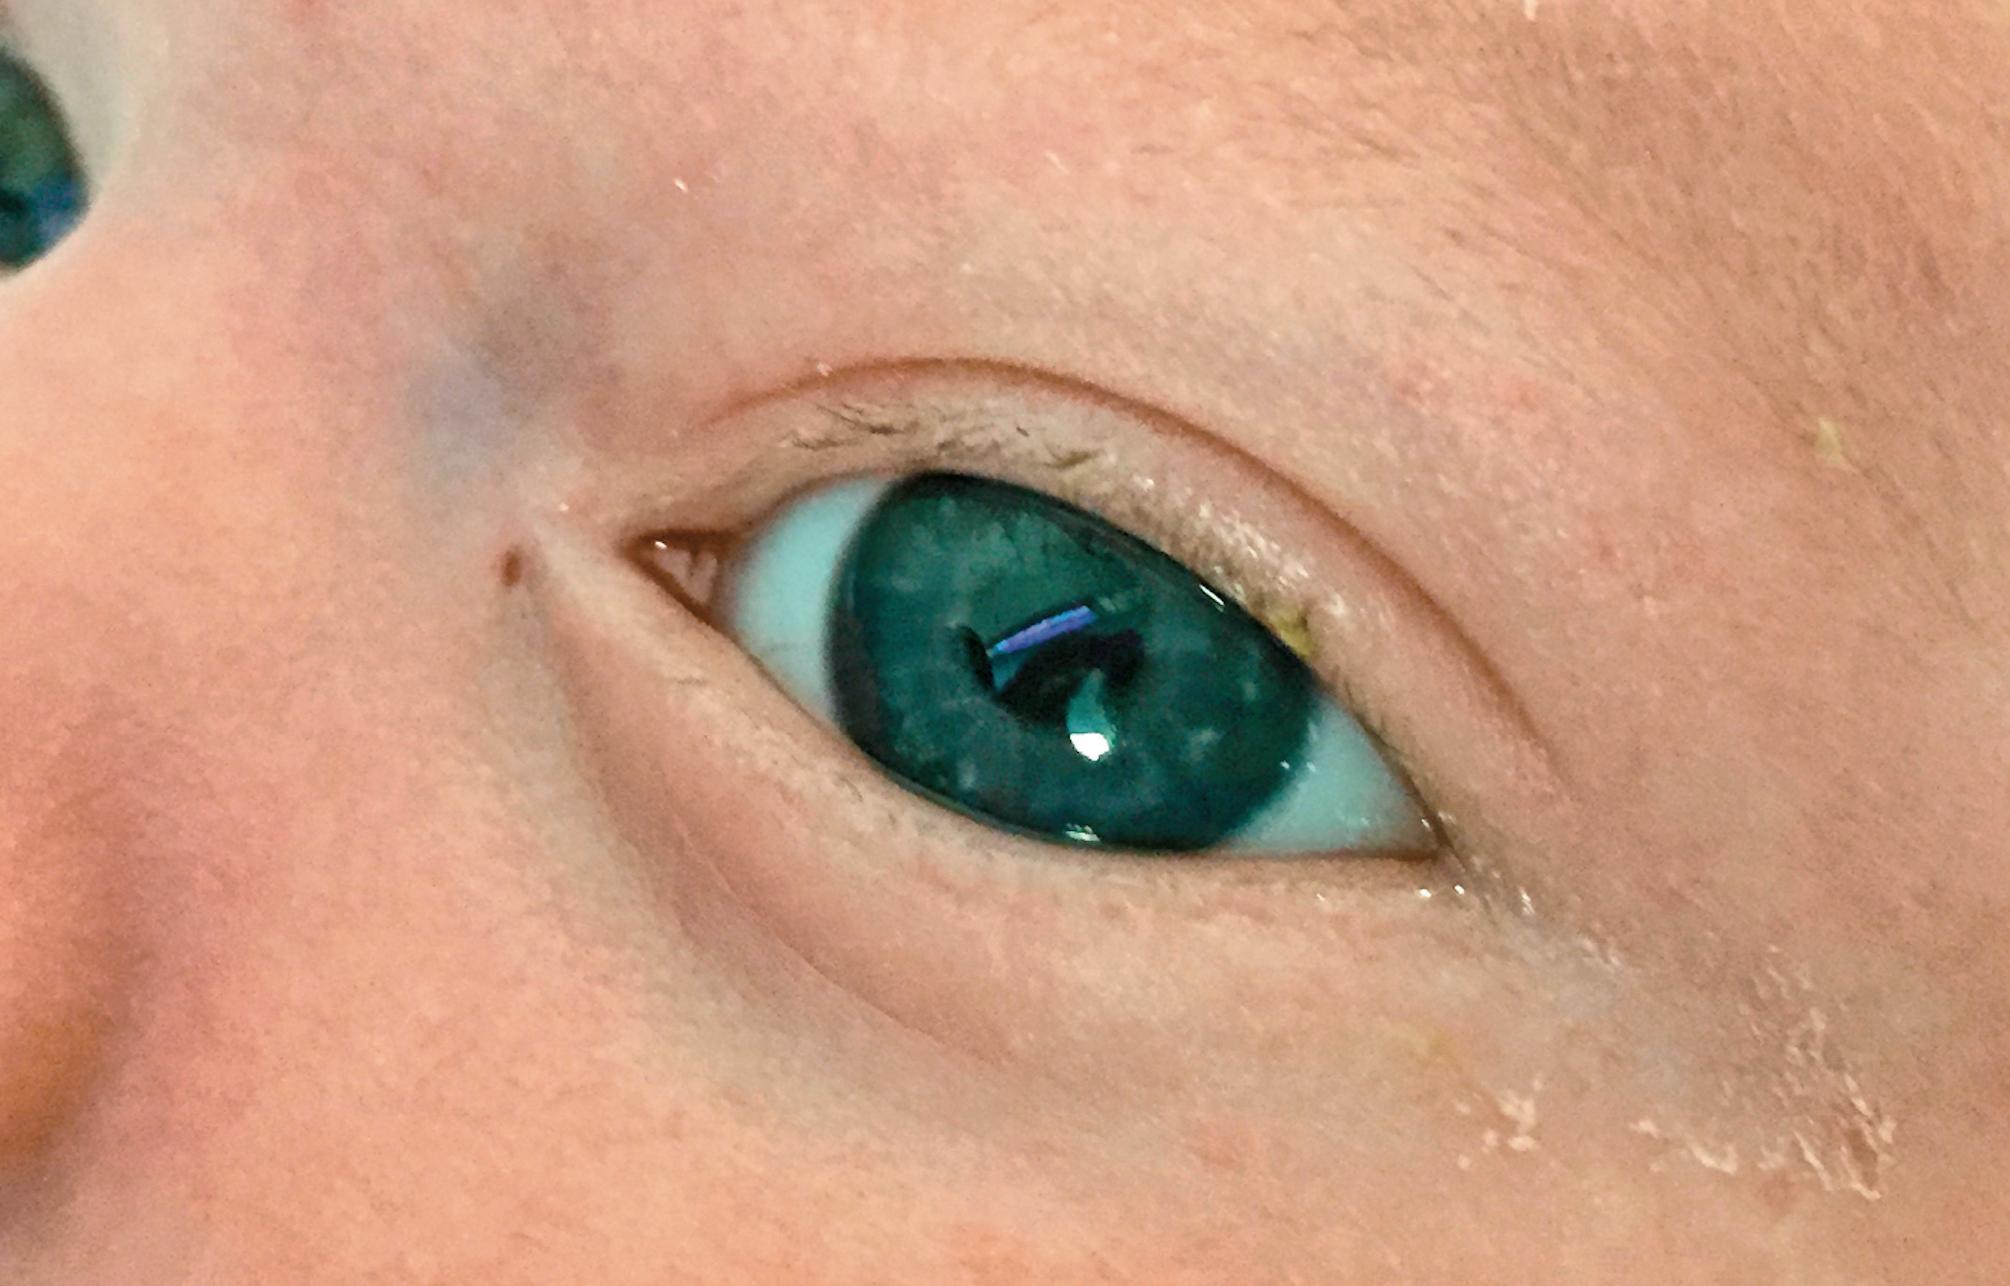 Fistula spied near infant's eye